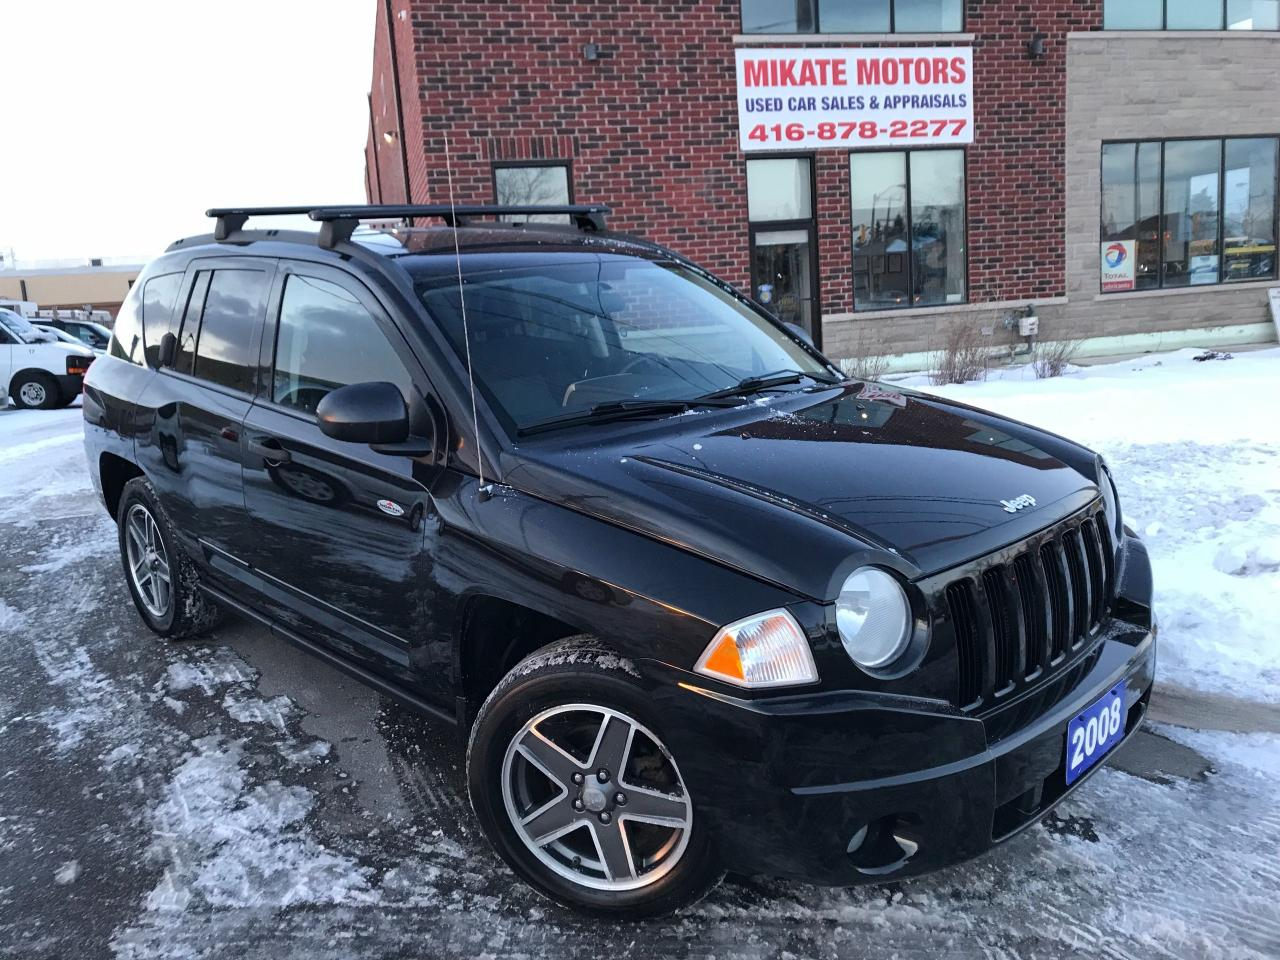 2008 Jeep Compass sport 4x4